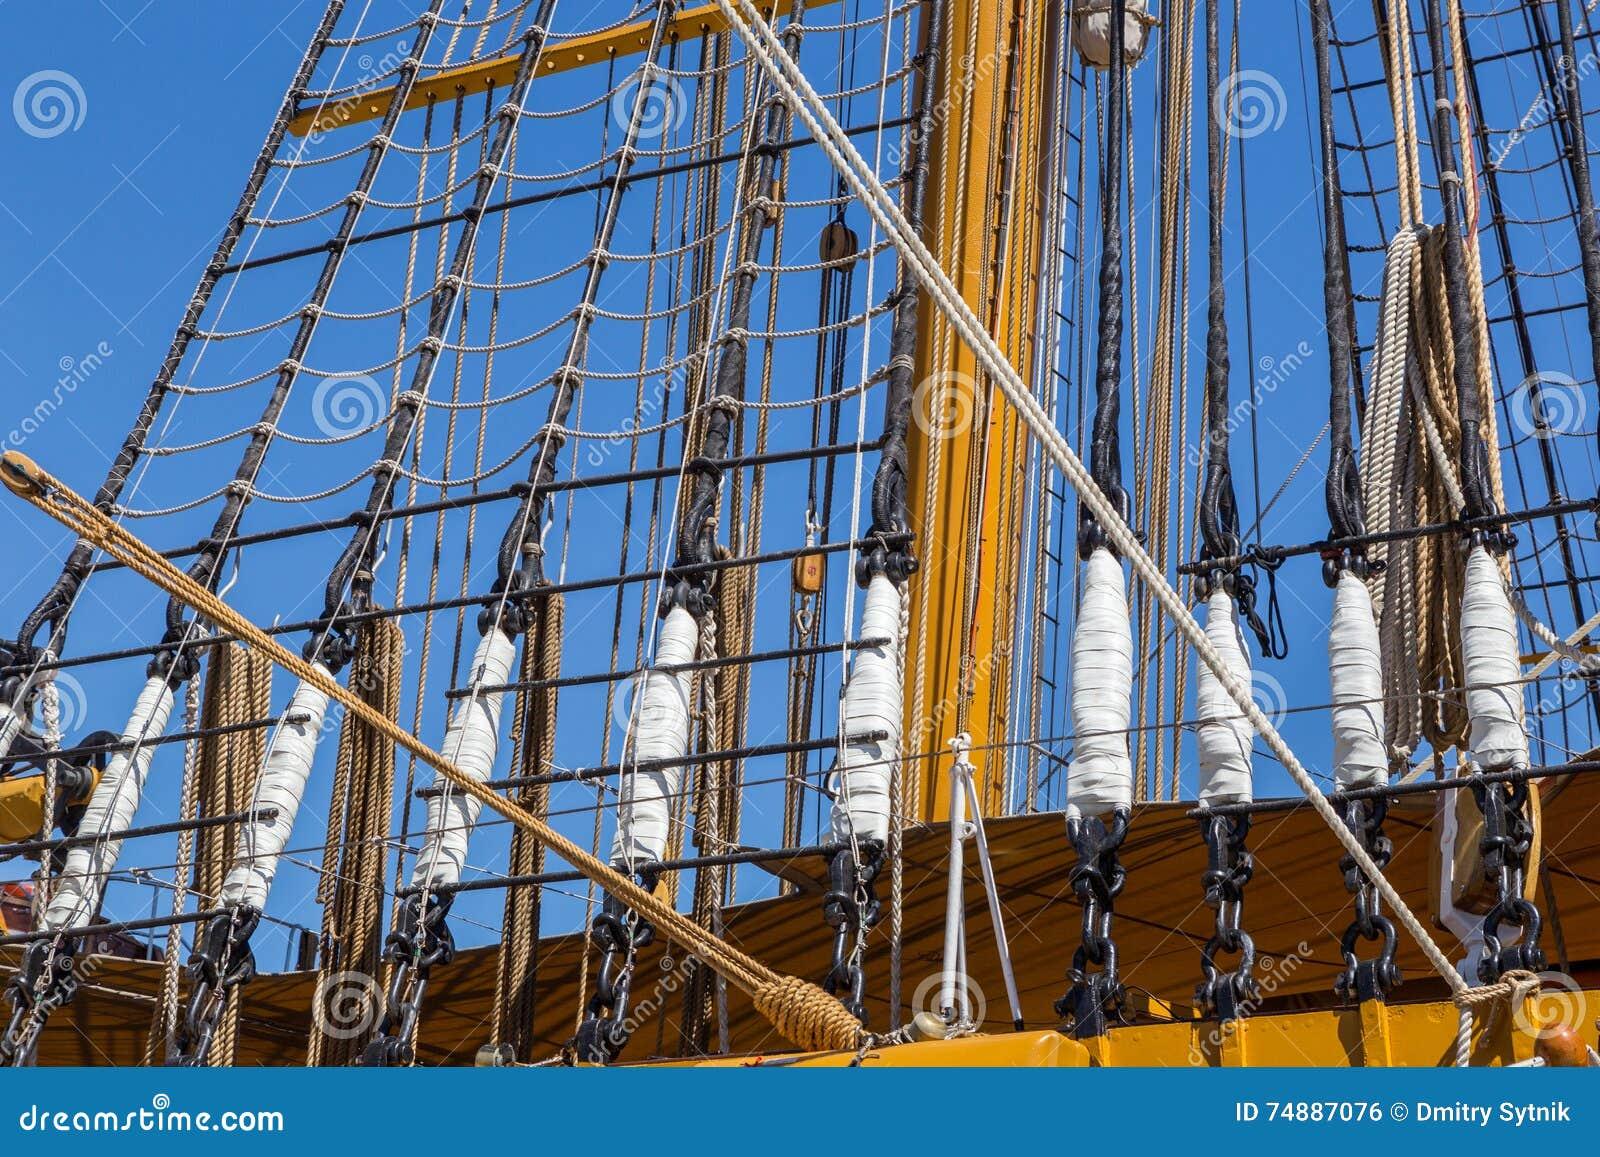 Detalha o equipamento do navio na plataforma